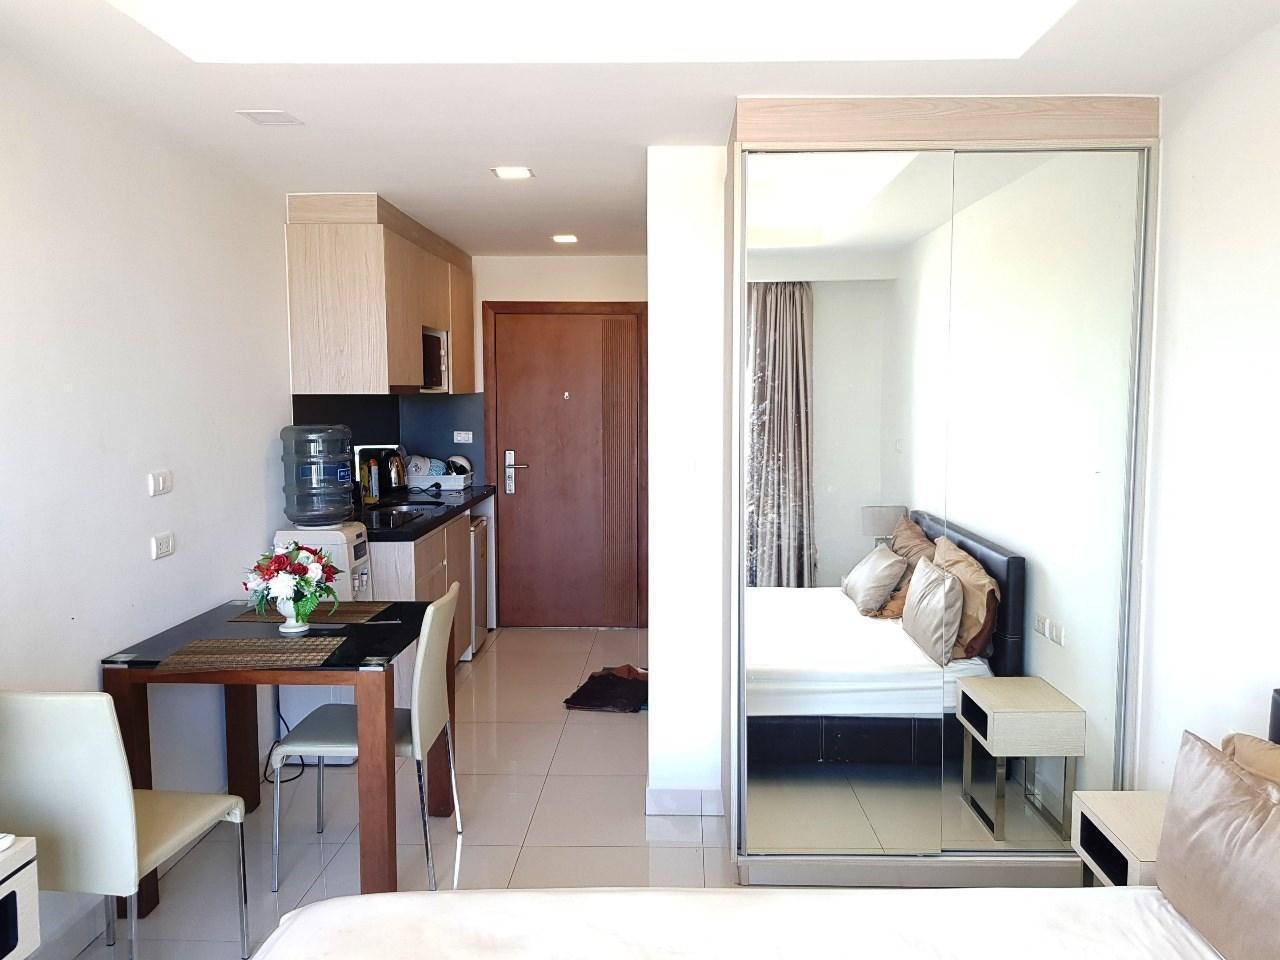 4 Star Condo  - Laguna Beach Resort 2 , 6FL , 021 สตูดิโอ อพาร์ตเมนต์ 1 ห้องน้ำส่วนตัว ขนาด 25 ตร.ม. – หาดจอมเทียน